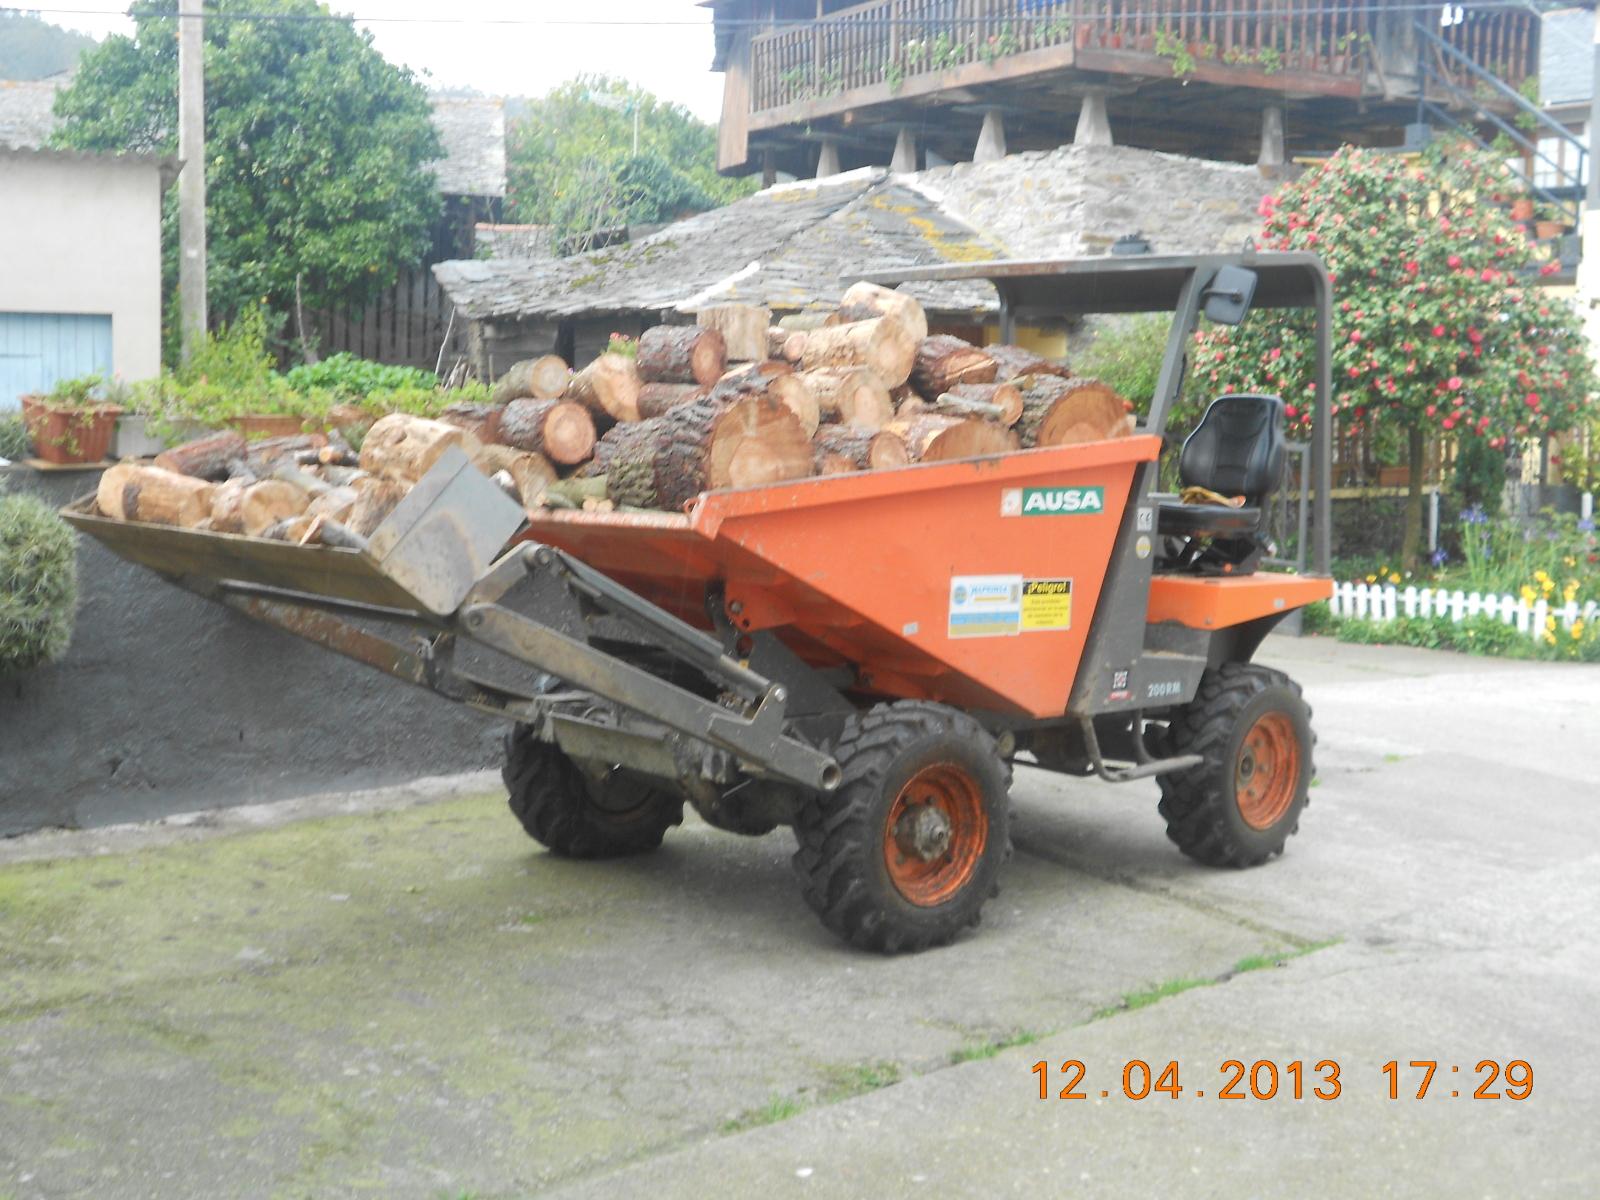 Fotos de agria 9900 E Y dumper Ausa Esng29